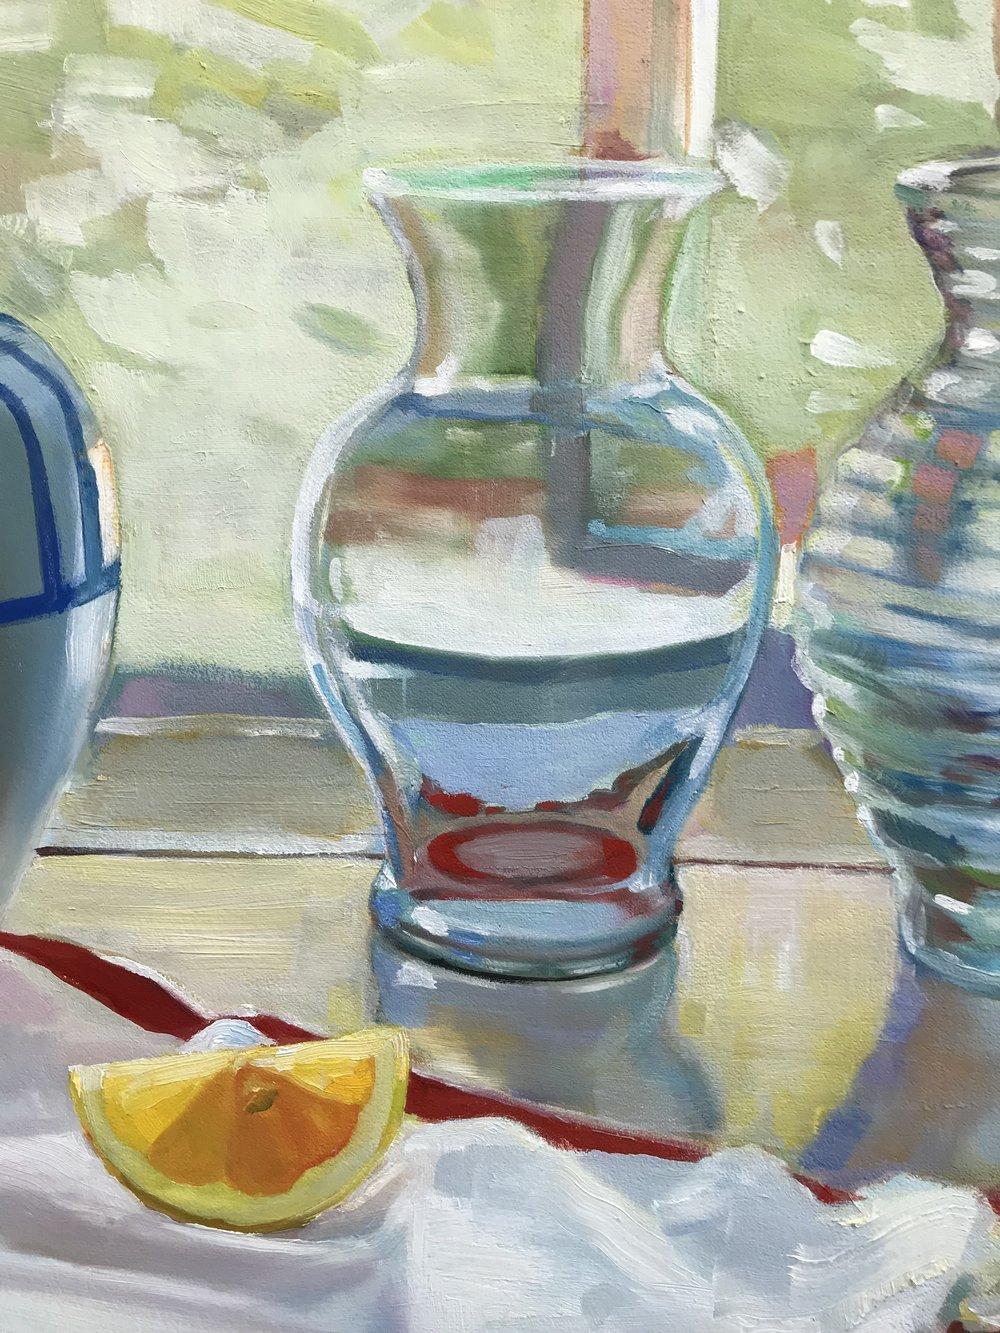 vase detail.jpeg